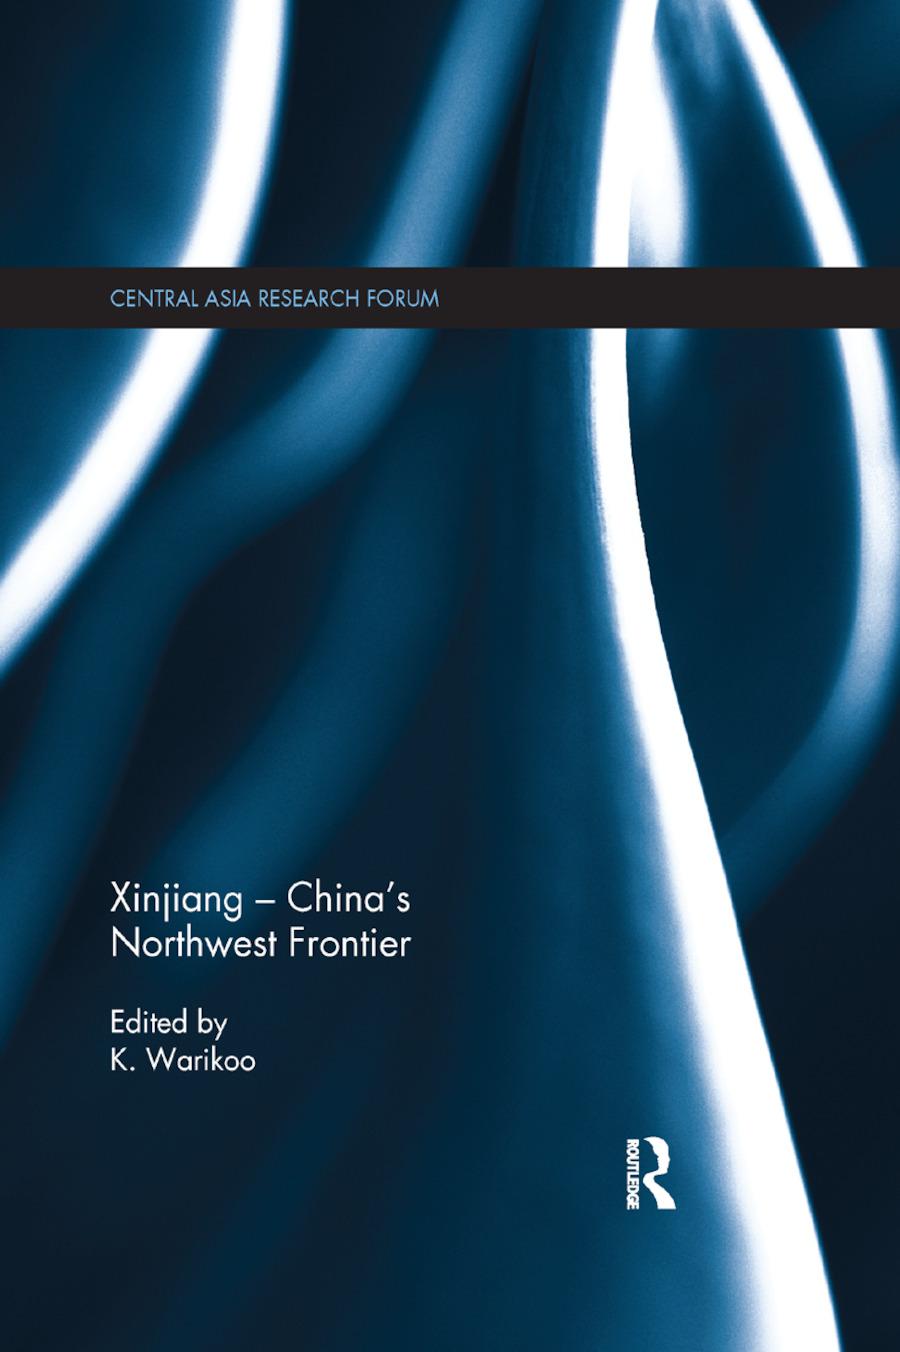 Xinjiang - China's Northwest Frontier